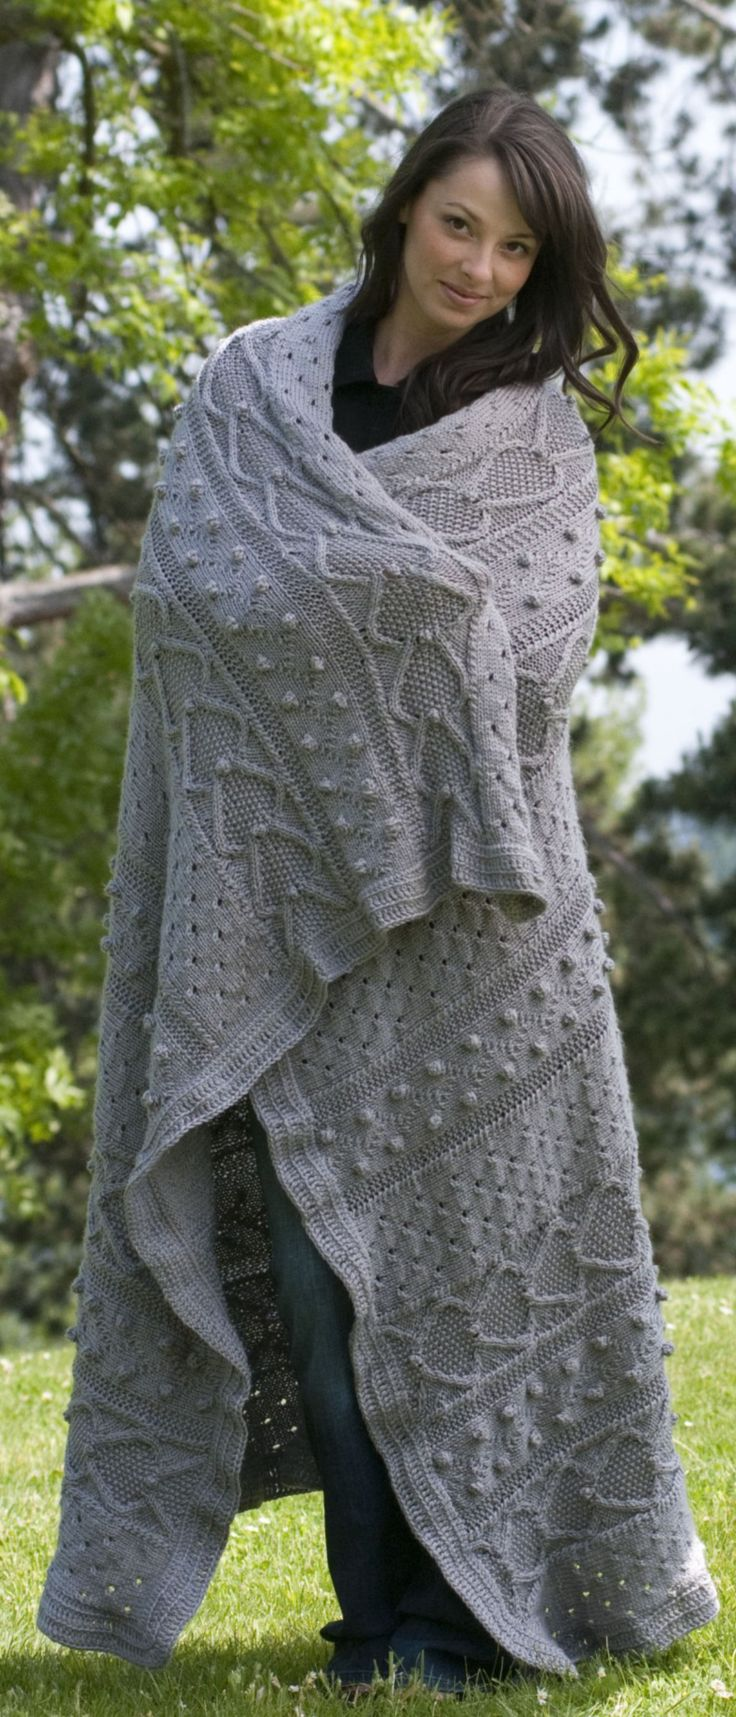 122 best Free Knitting Patterns images on Pinterest   Knit patterns ...